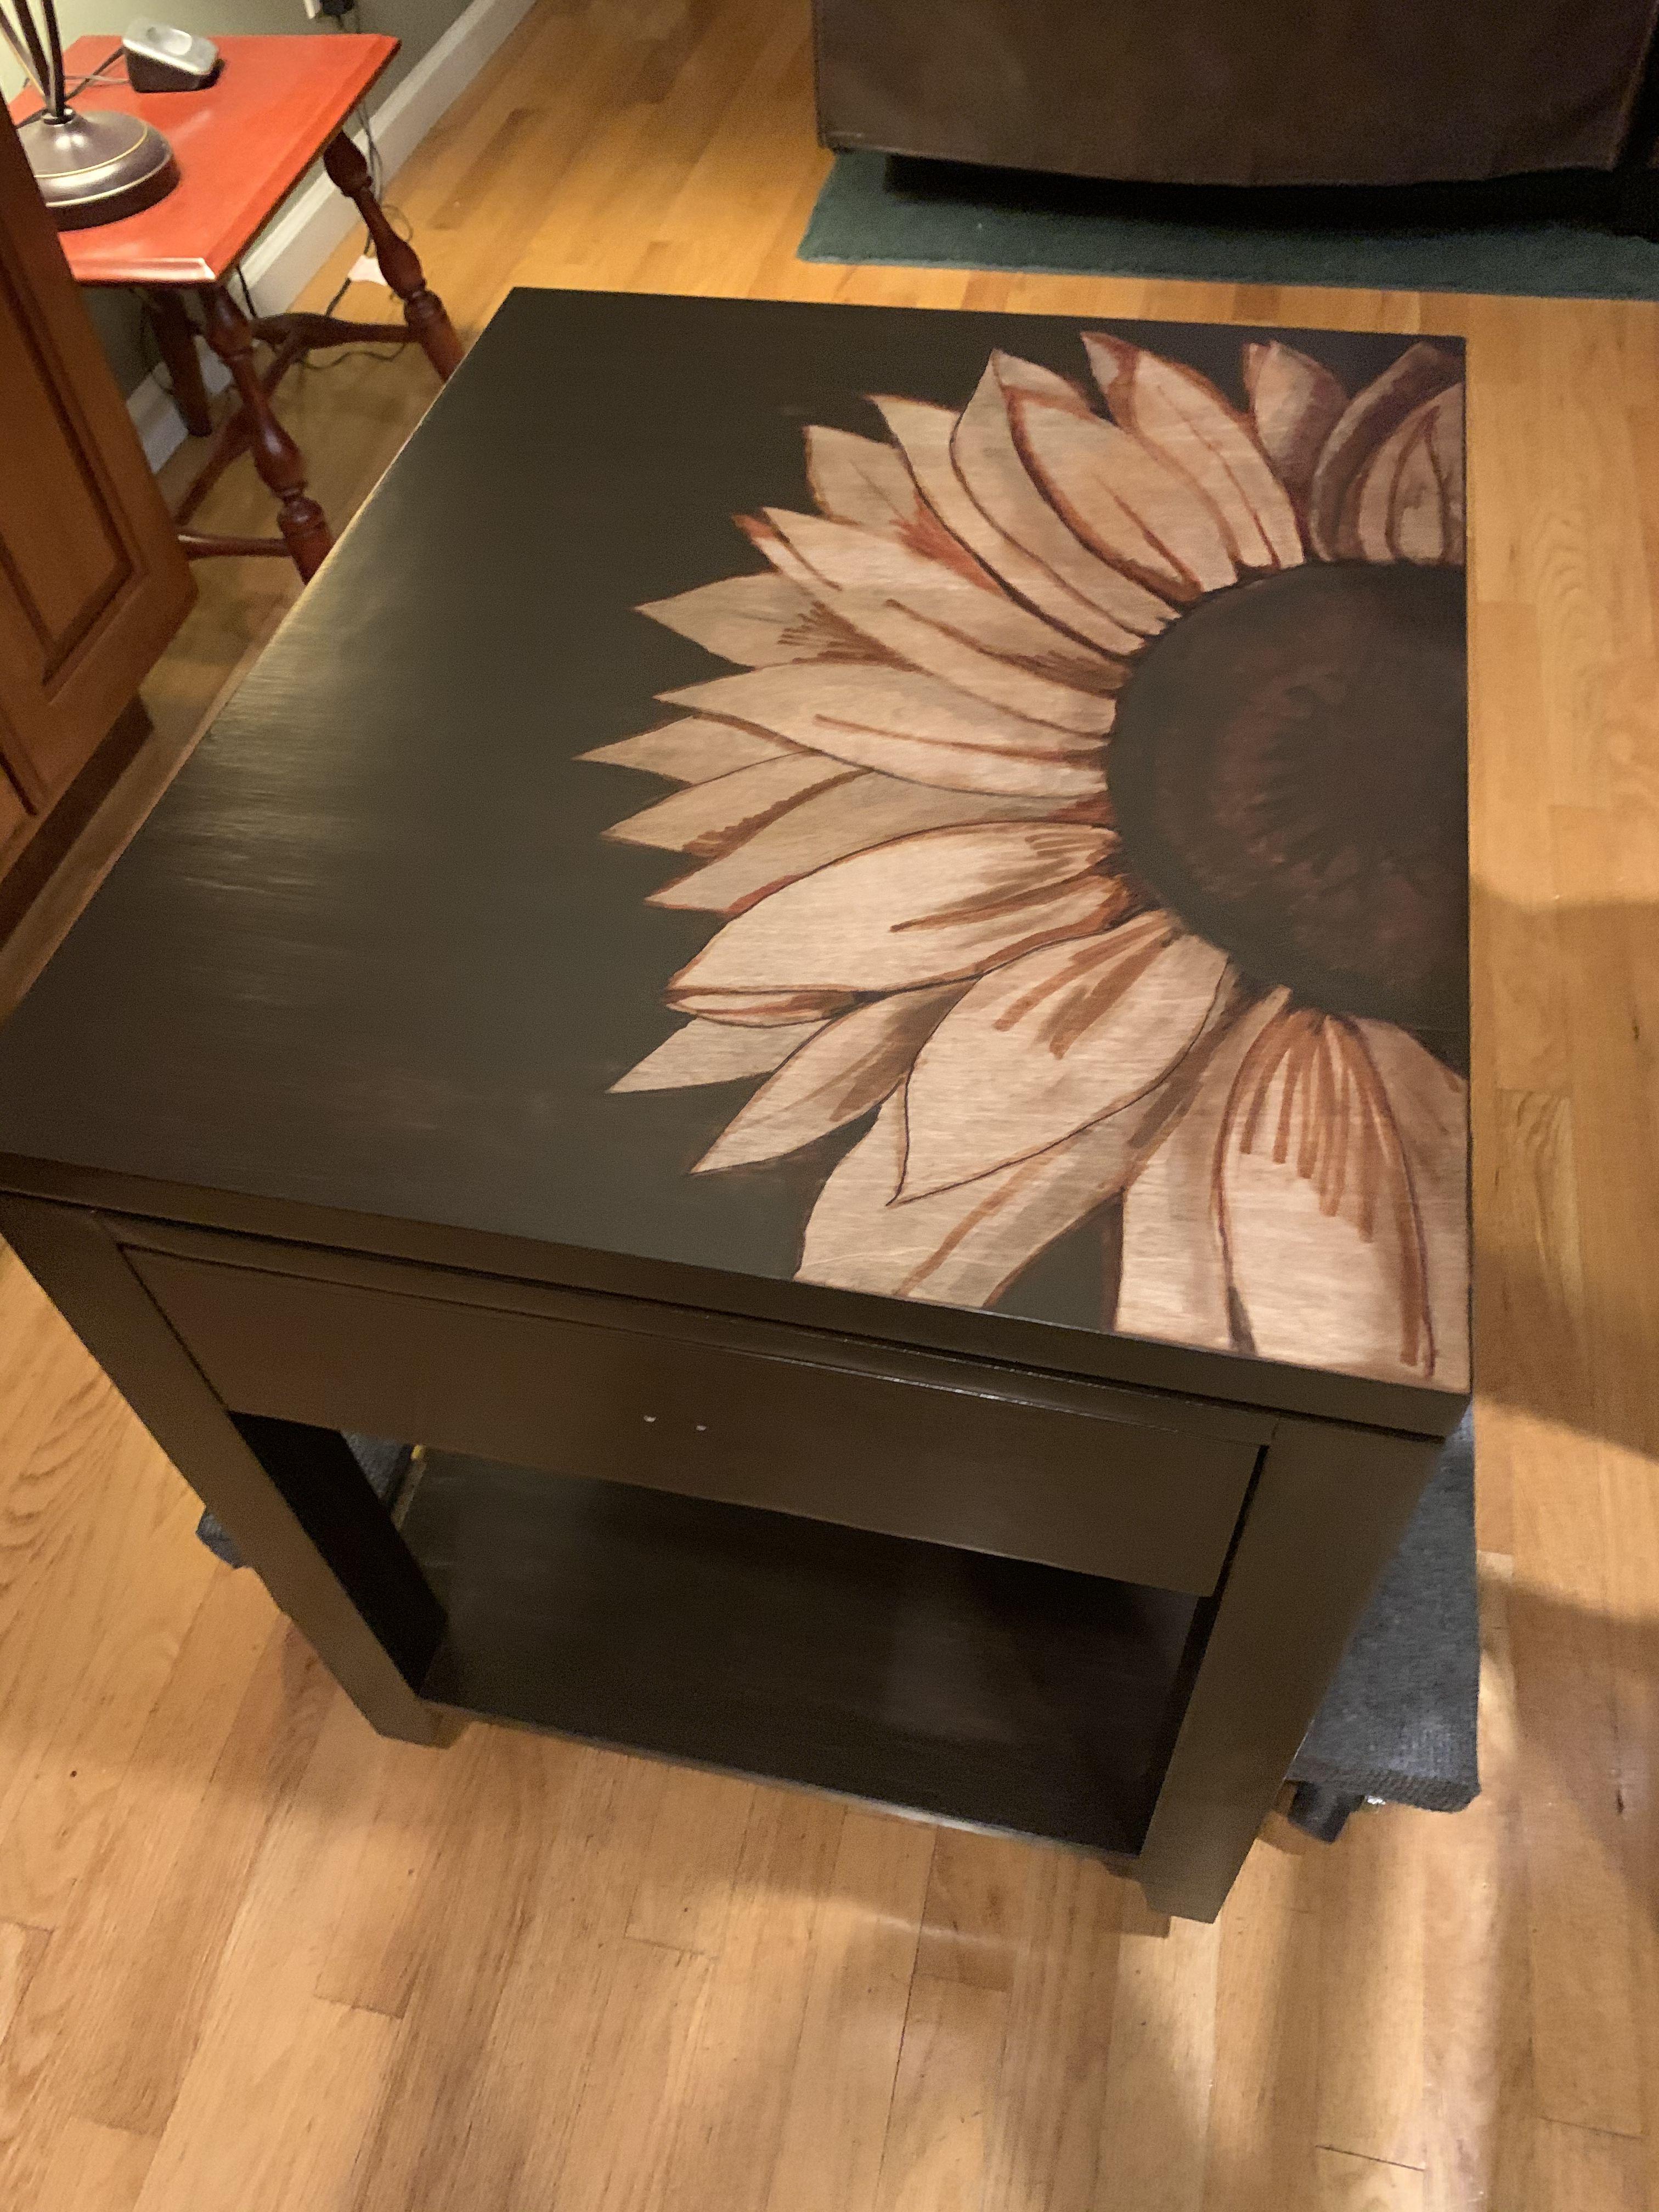 Beautiful hand painted sunflower table @sunflowerart @sunflowertable @customfurniturebysuzi @custompaintbysuzi